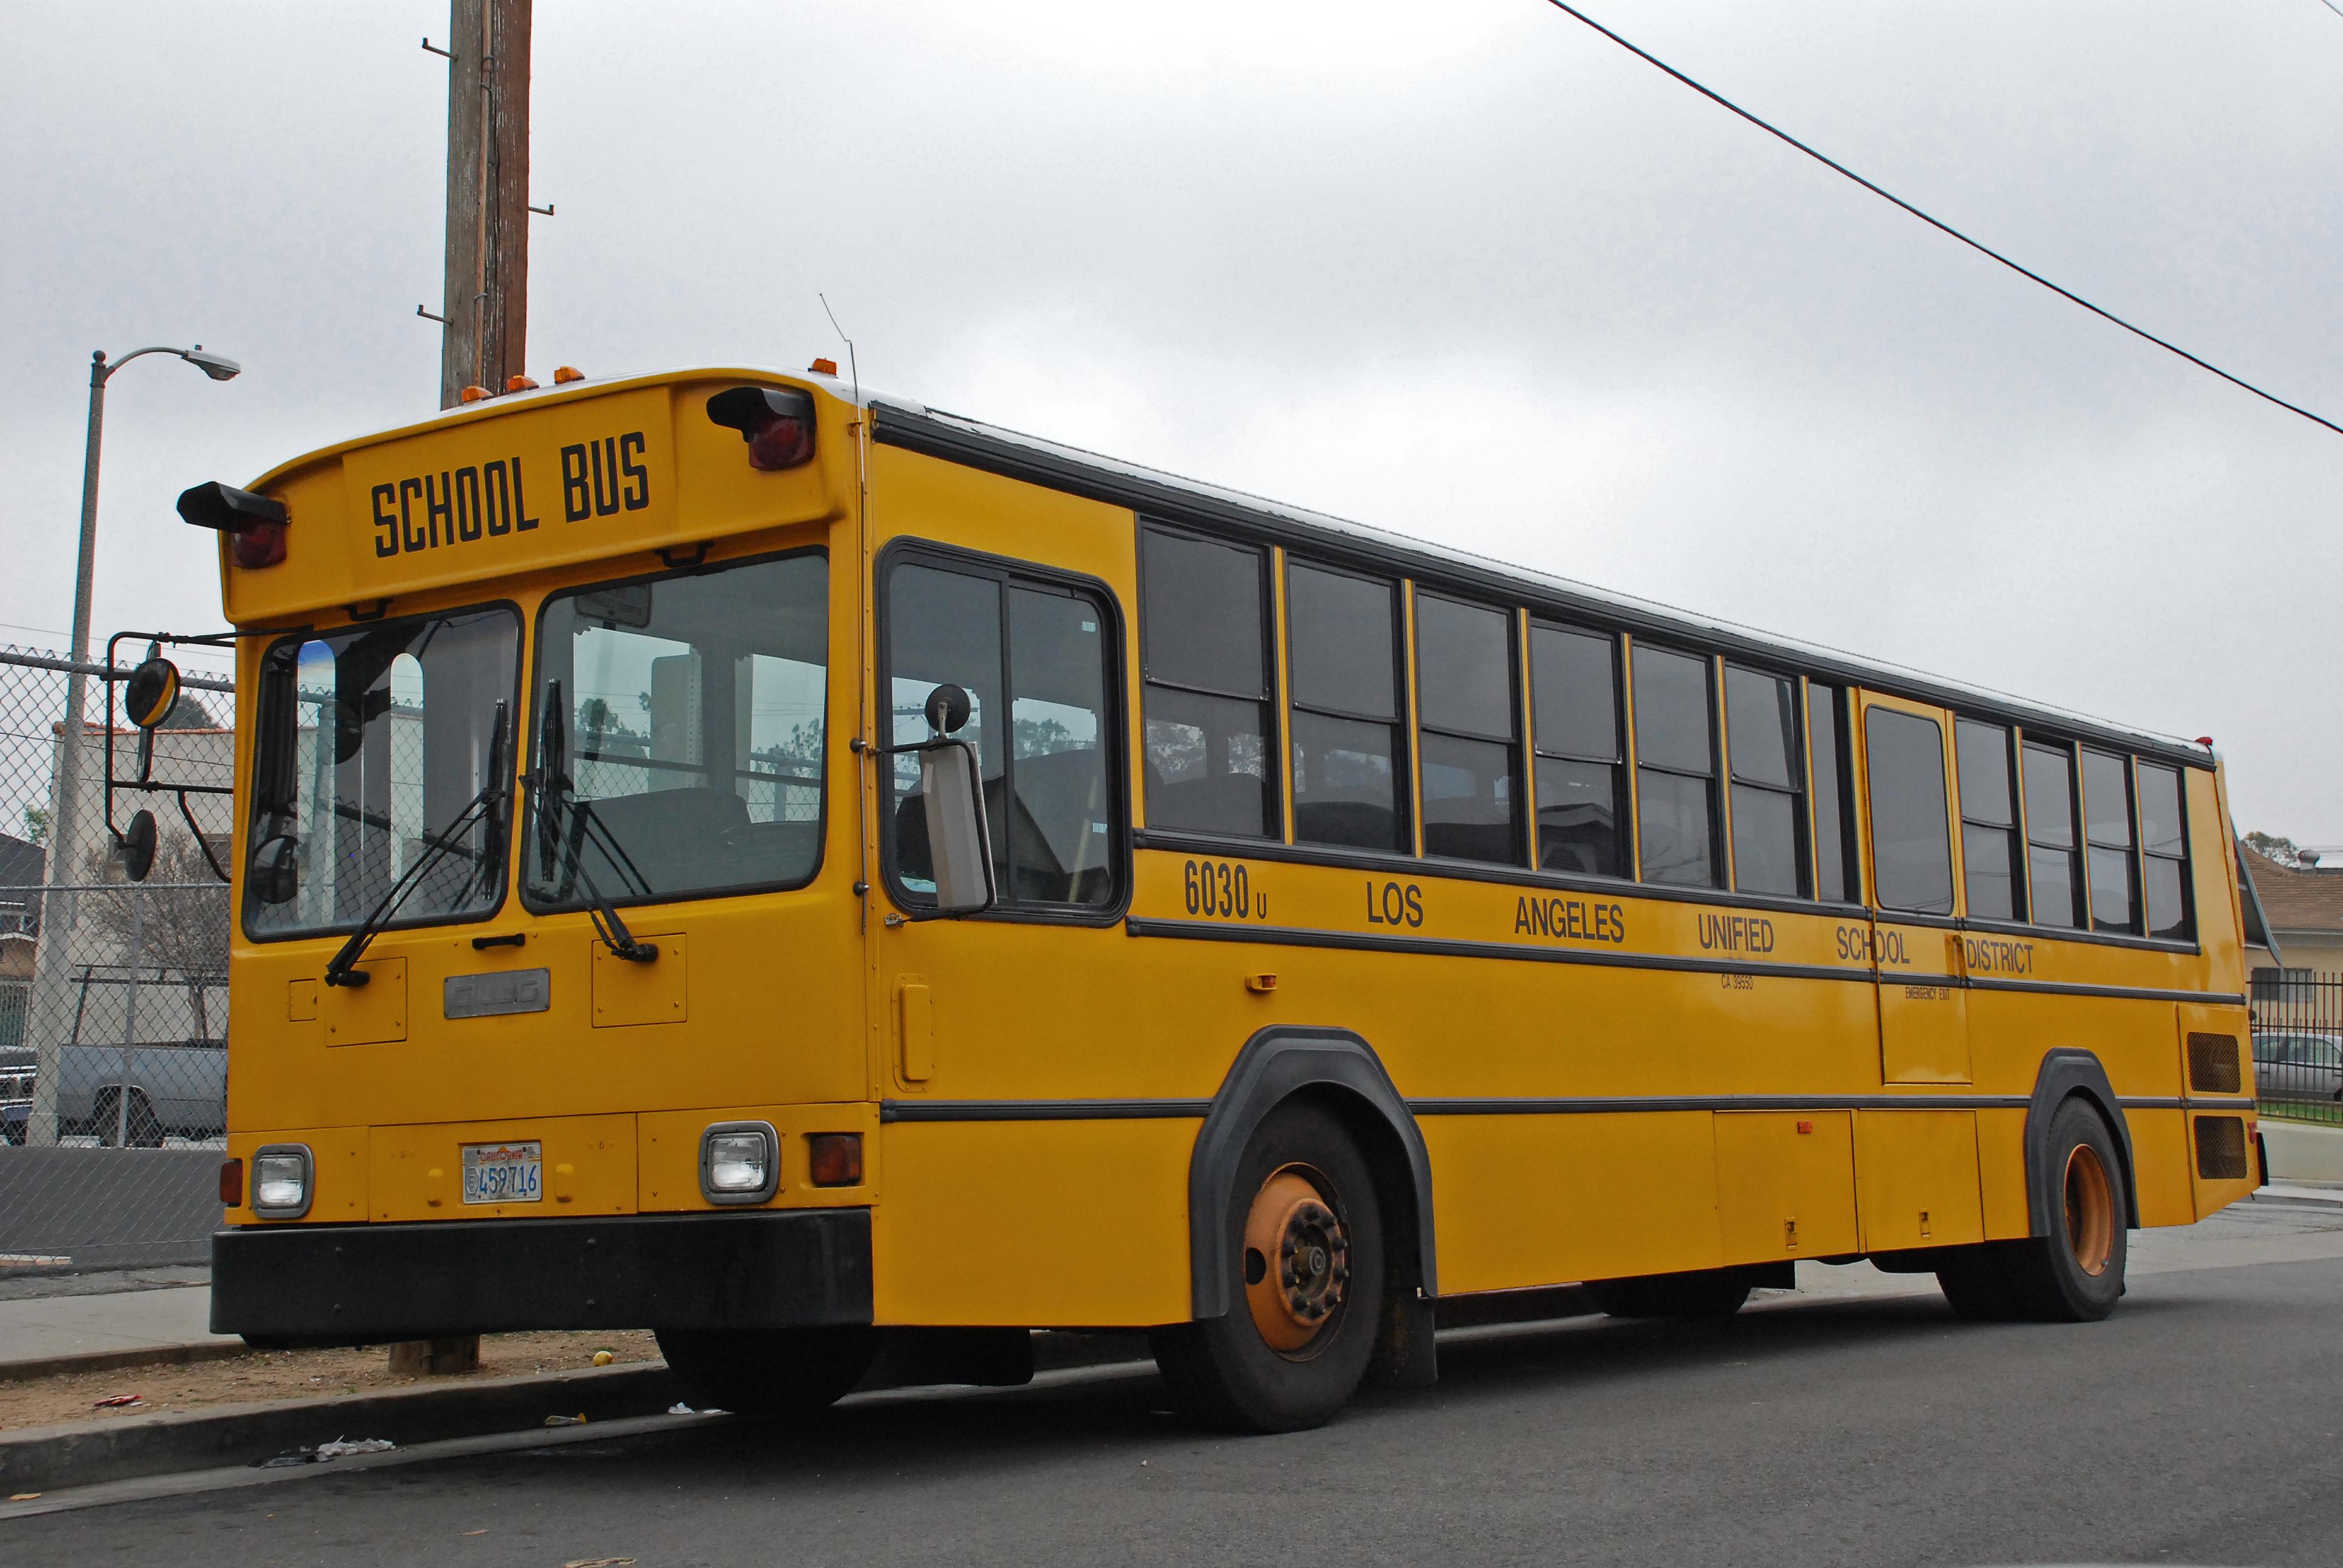 File:Gillig Phantom School Bus LAUSD.jpg - Wikimedia Commons